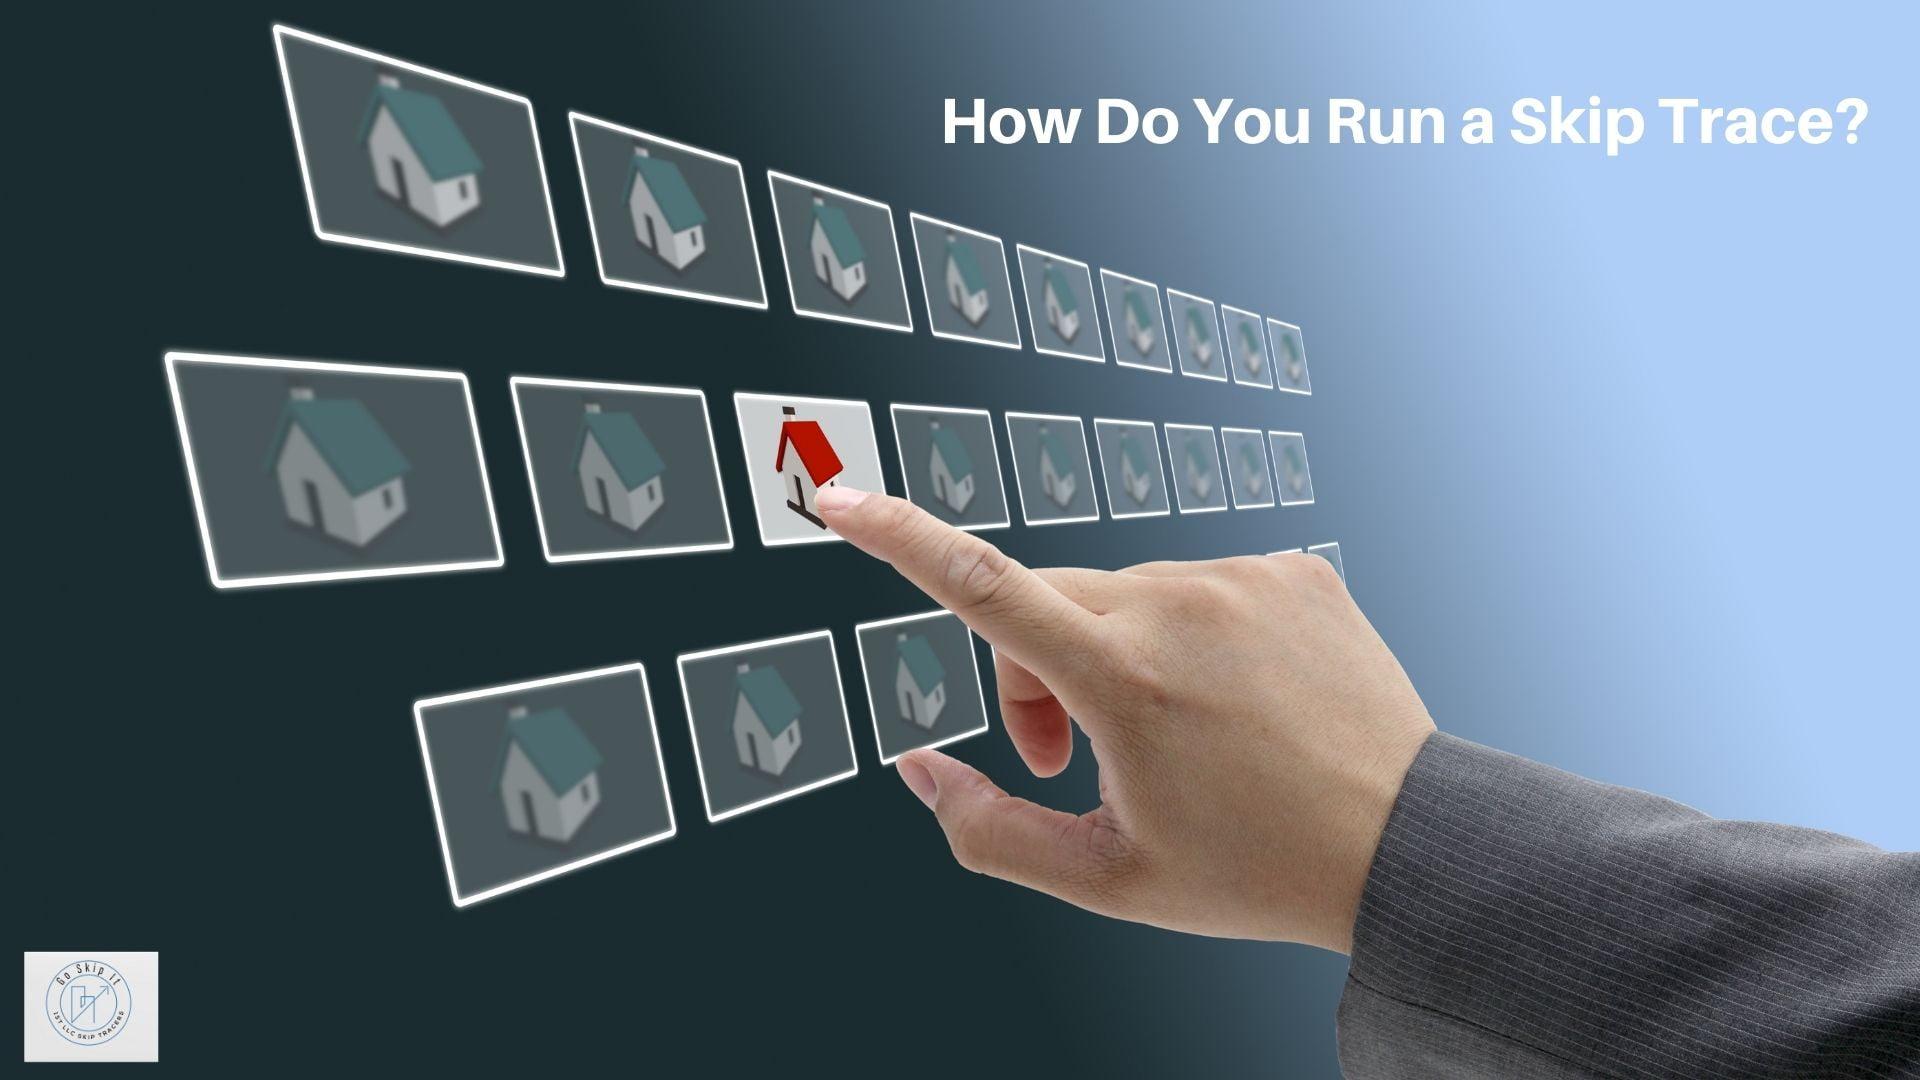 How Do You Run a Skip Trace?